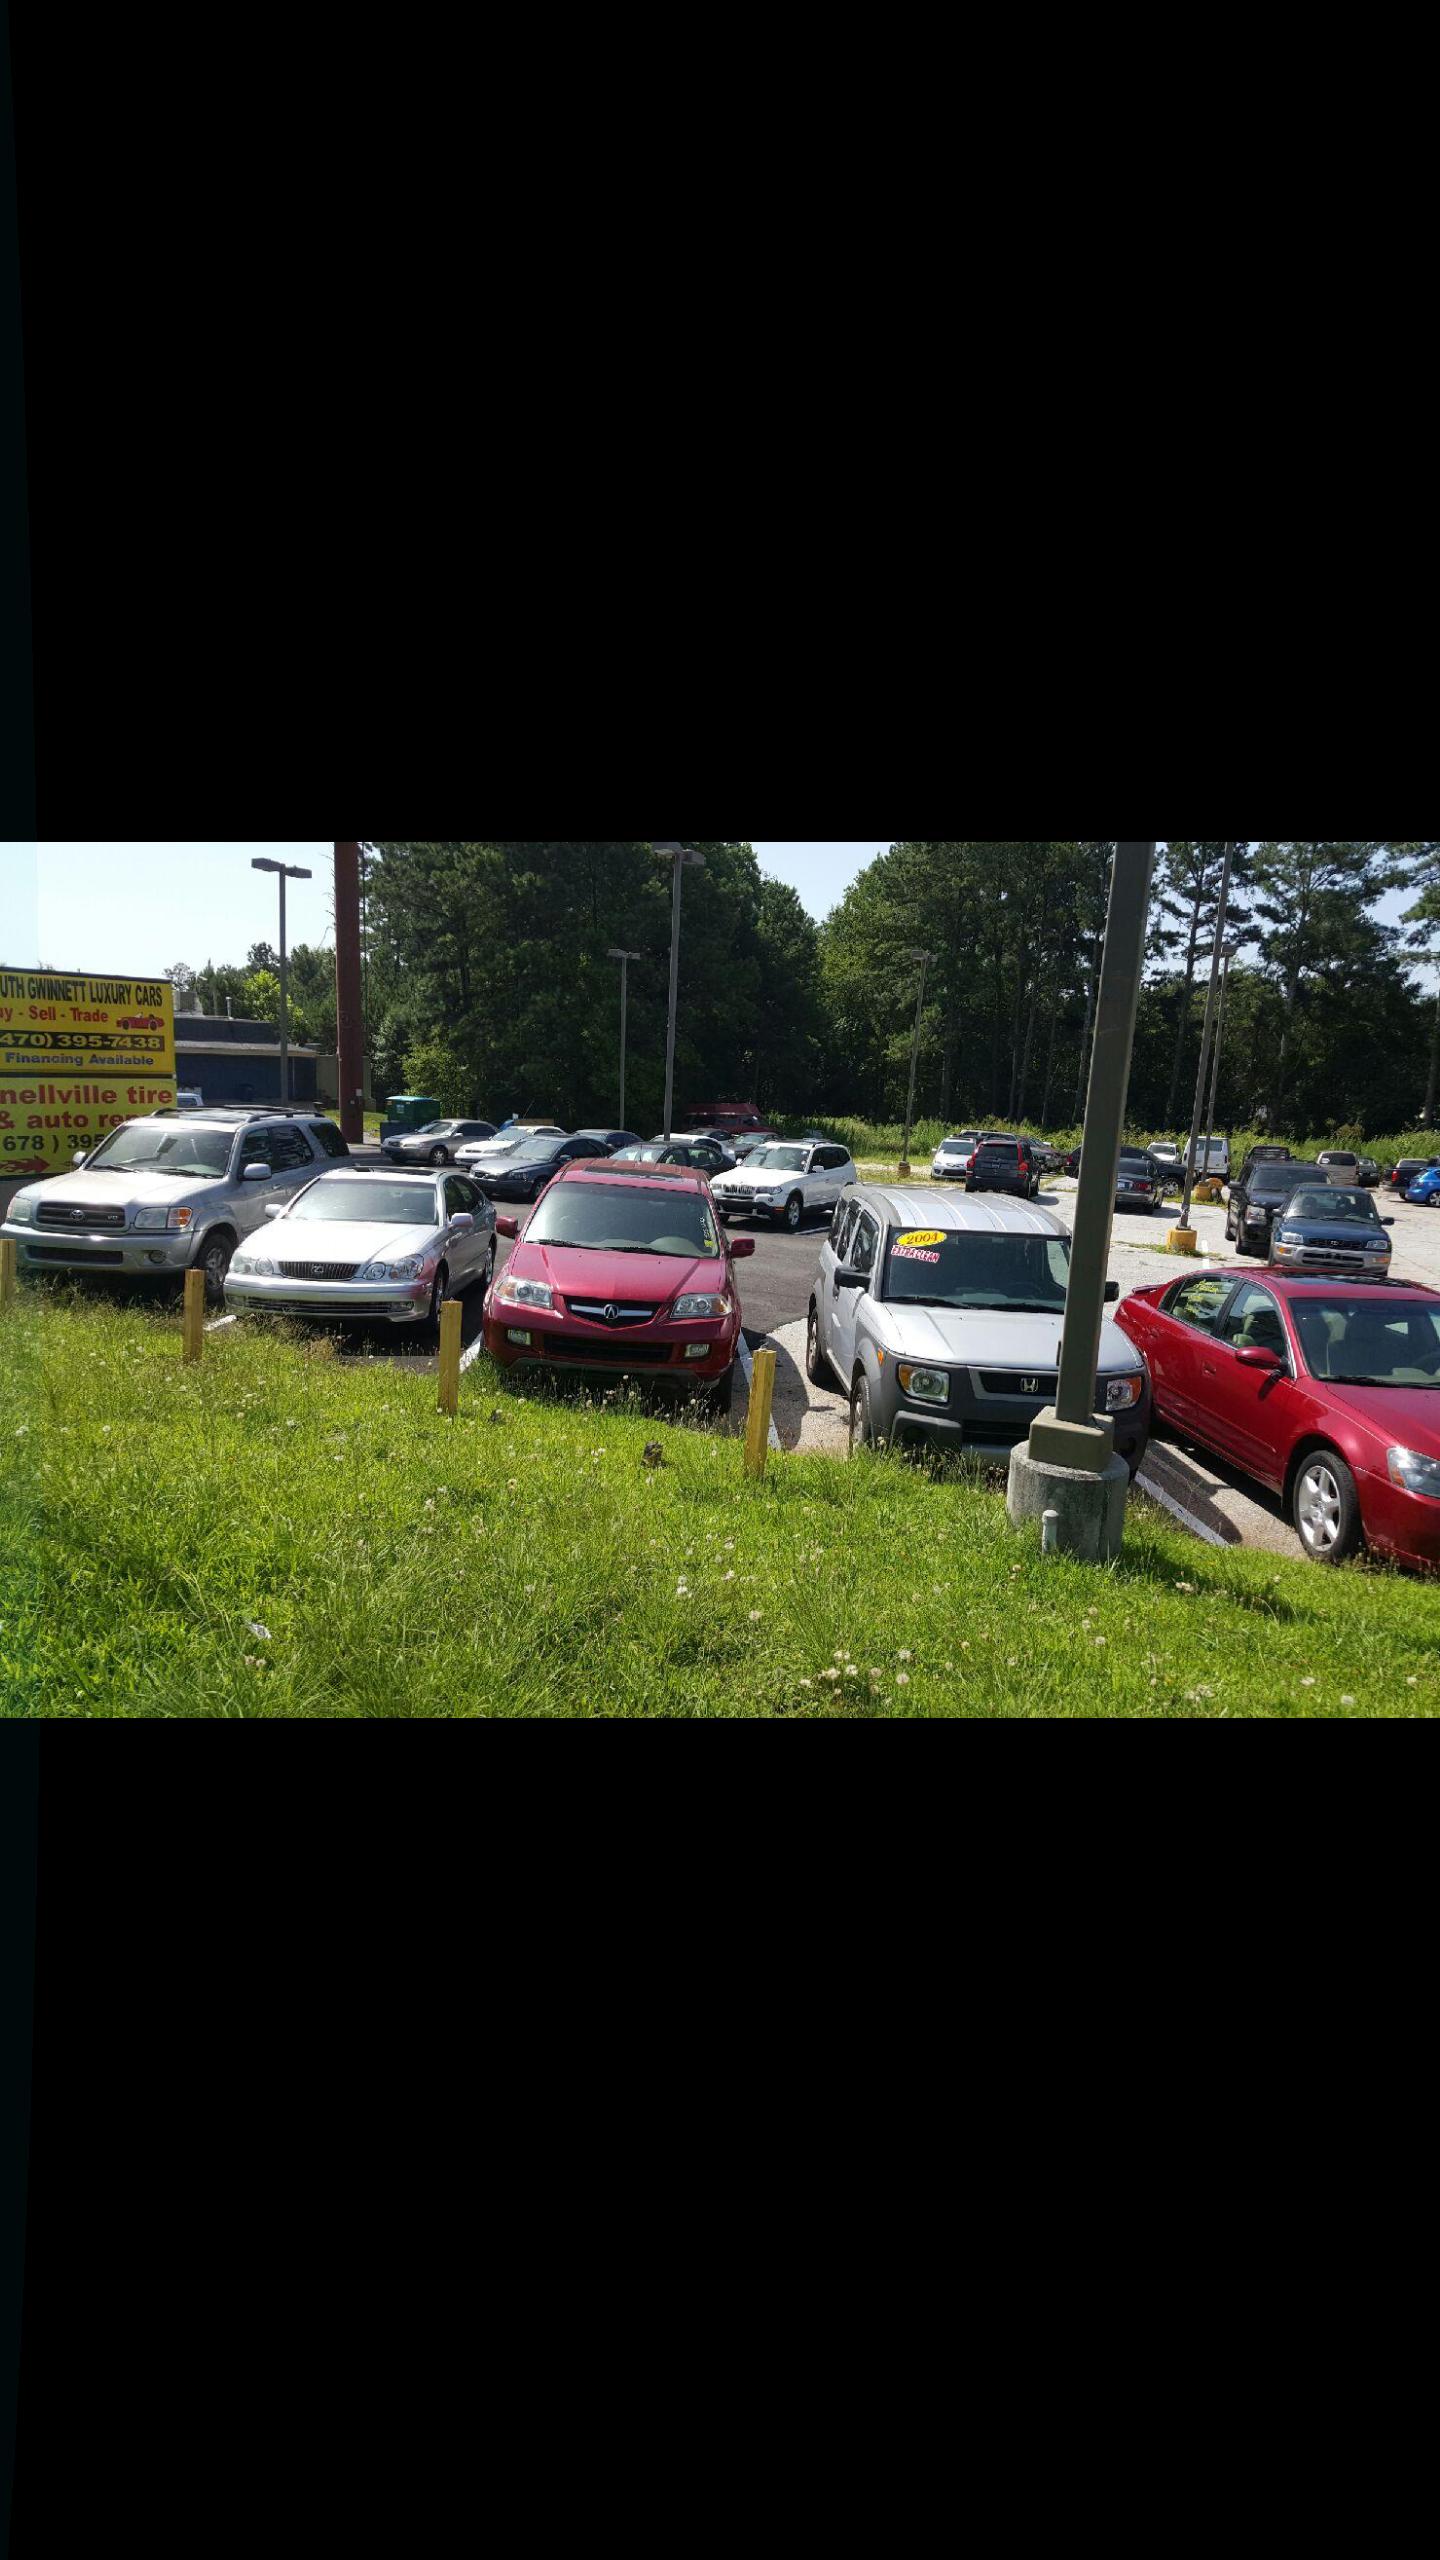 Luxury Cars Of Gwinnett >> South Gwinnett Luxury Cars 2034 Main St E Snellville Ga 30078 Yp Com